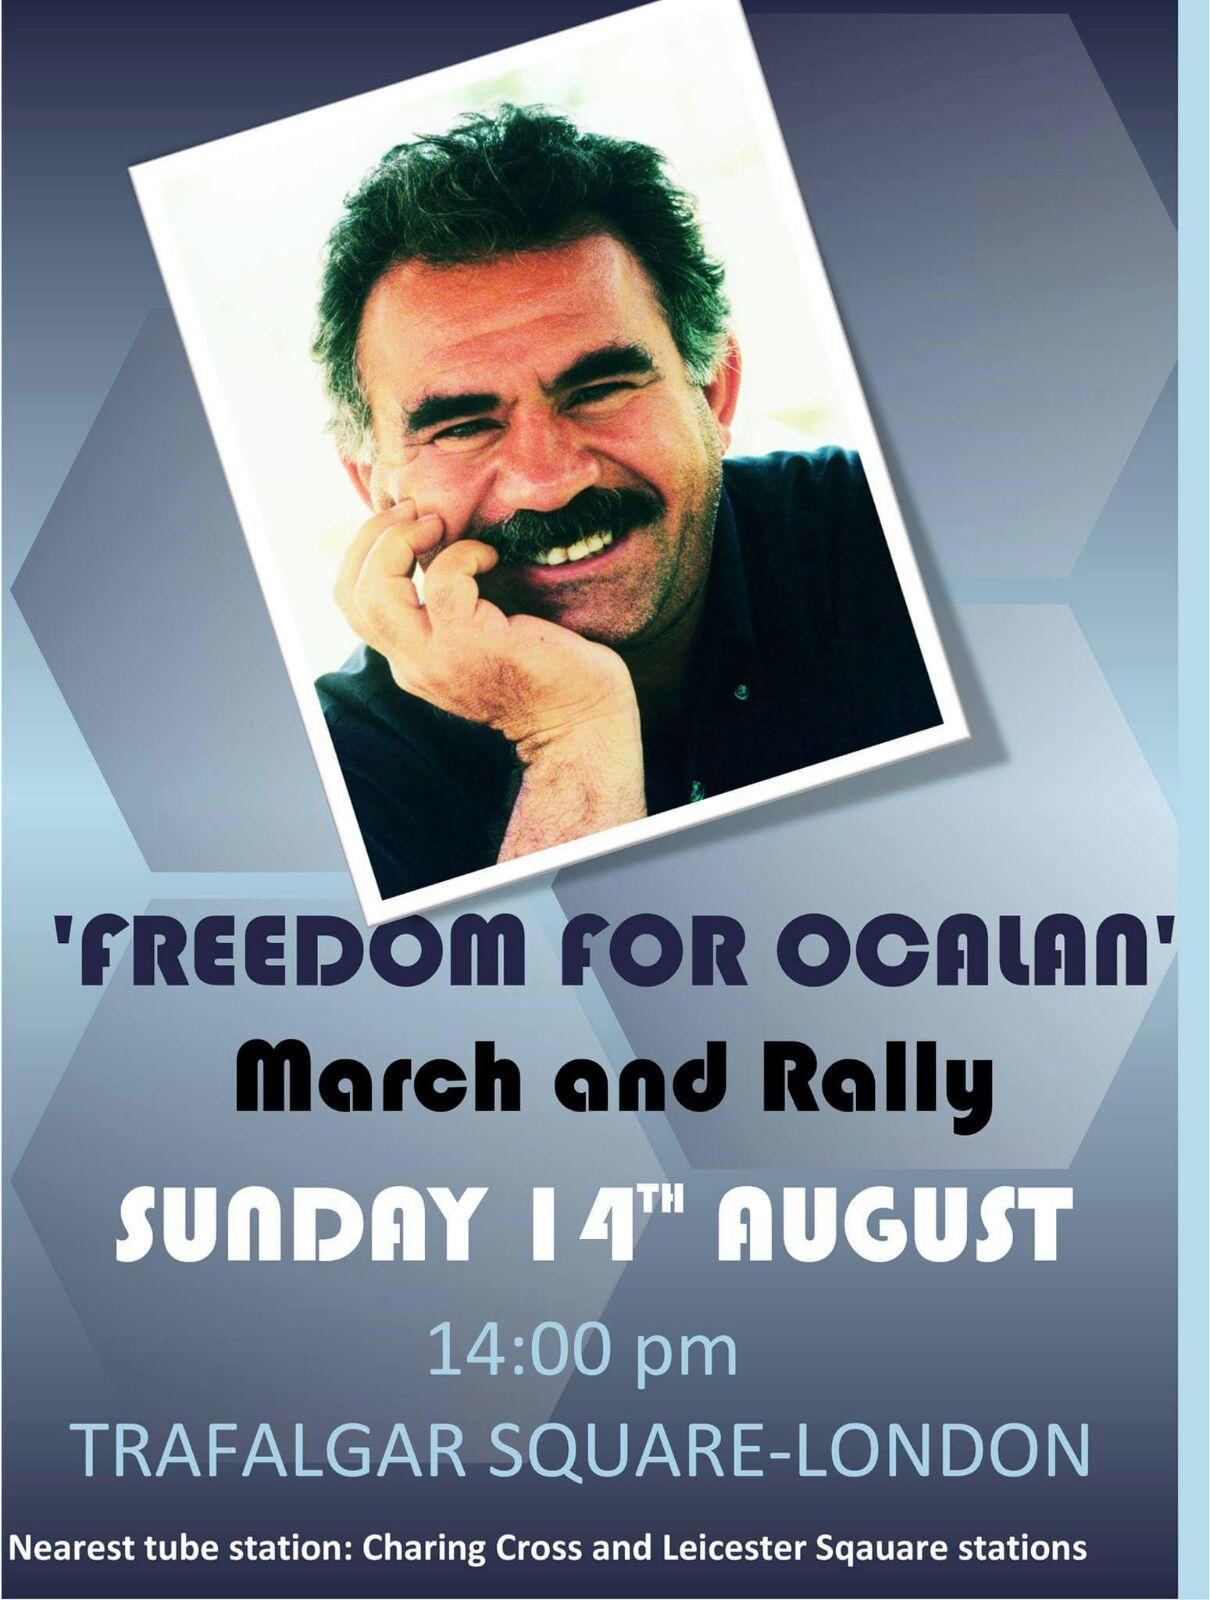 Ocalan